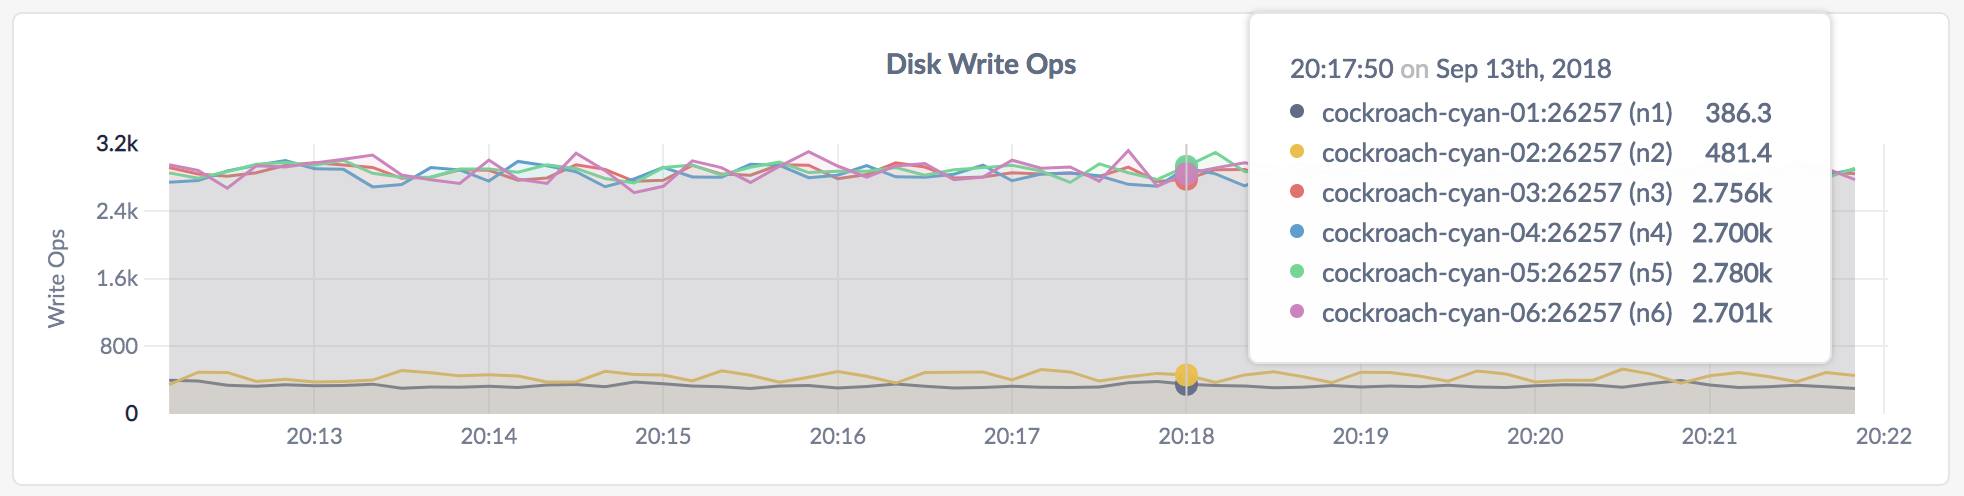 CockroachDB Admin UI Disk Write Ops graph